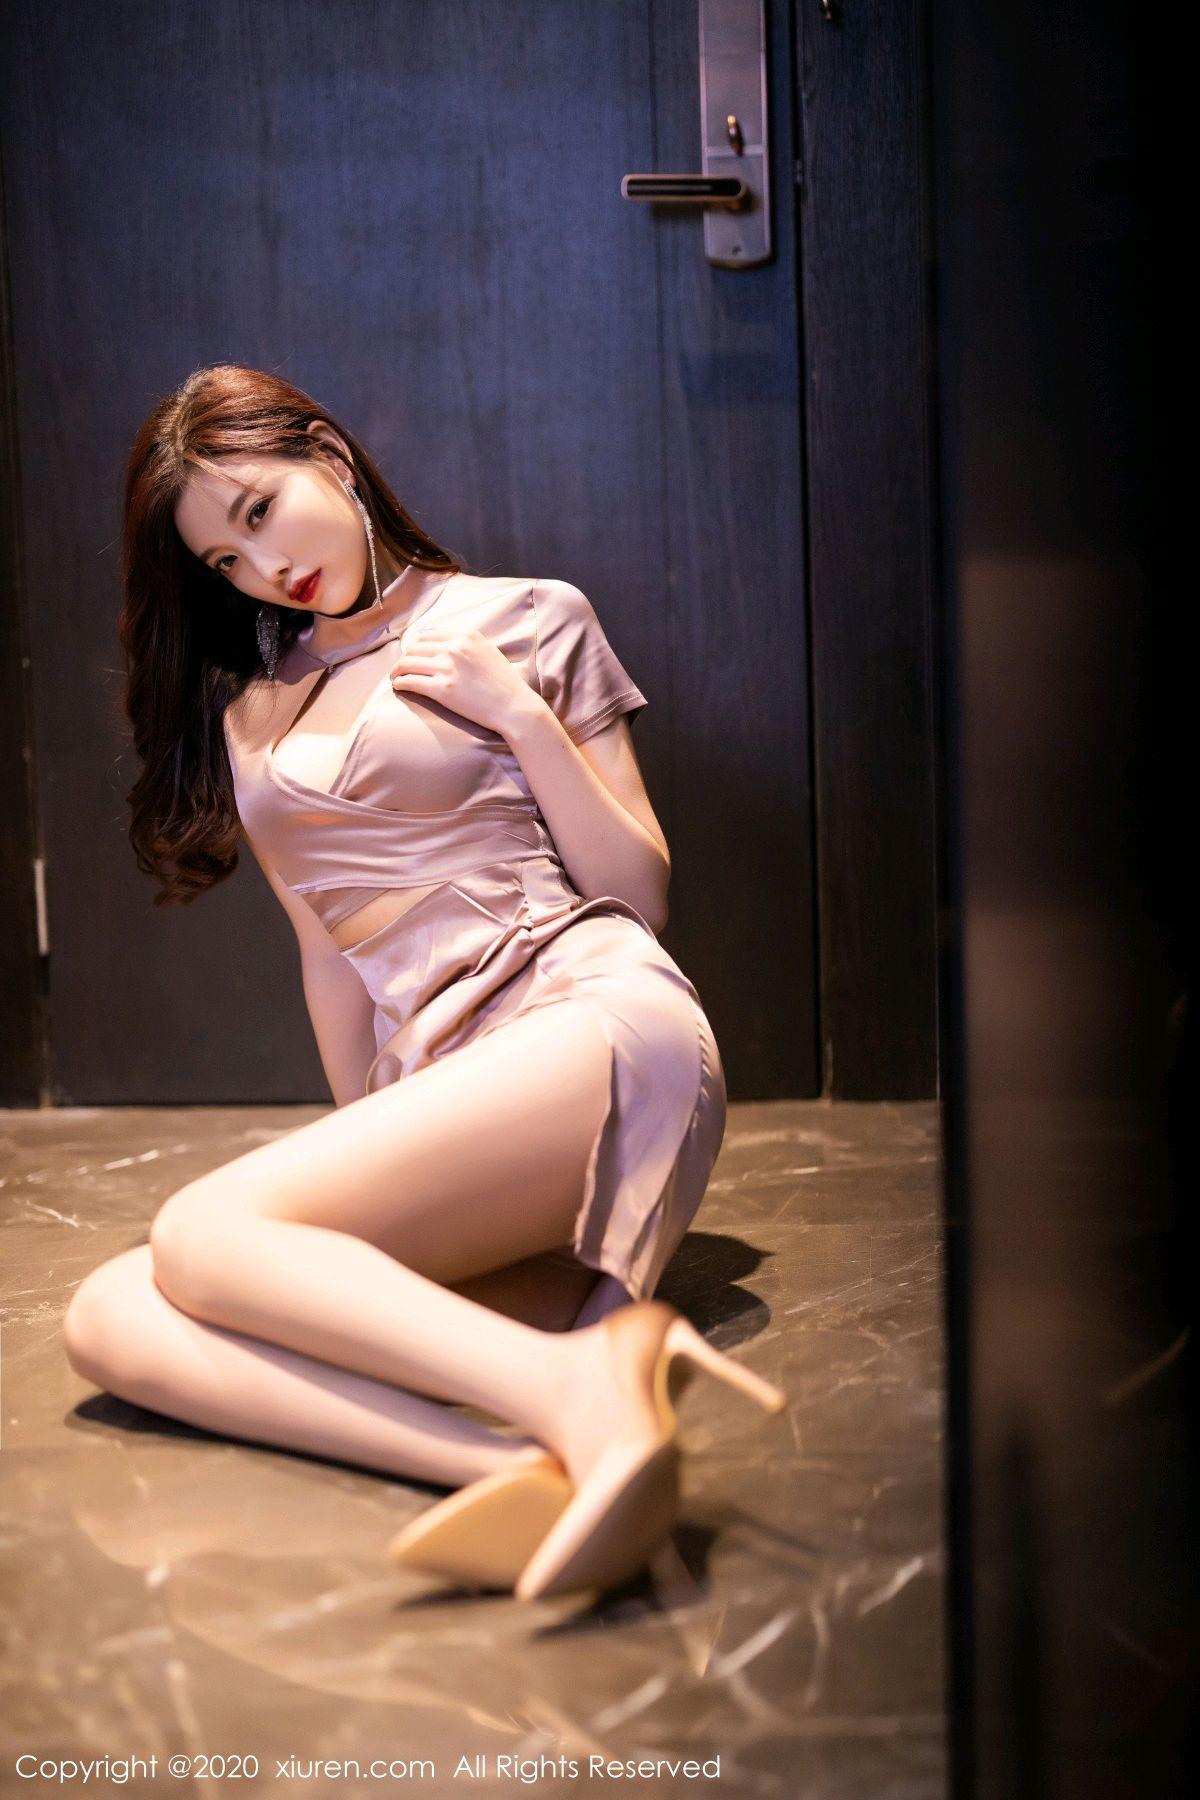 [XiuRen] Vol.2587 Yang Chen Chen 44P, Underwear, Xiuren, Yang Chen Chen